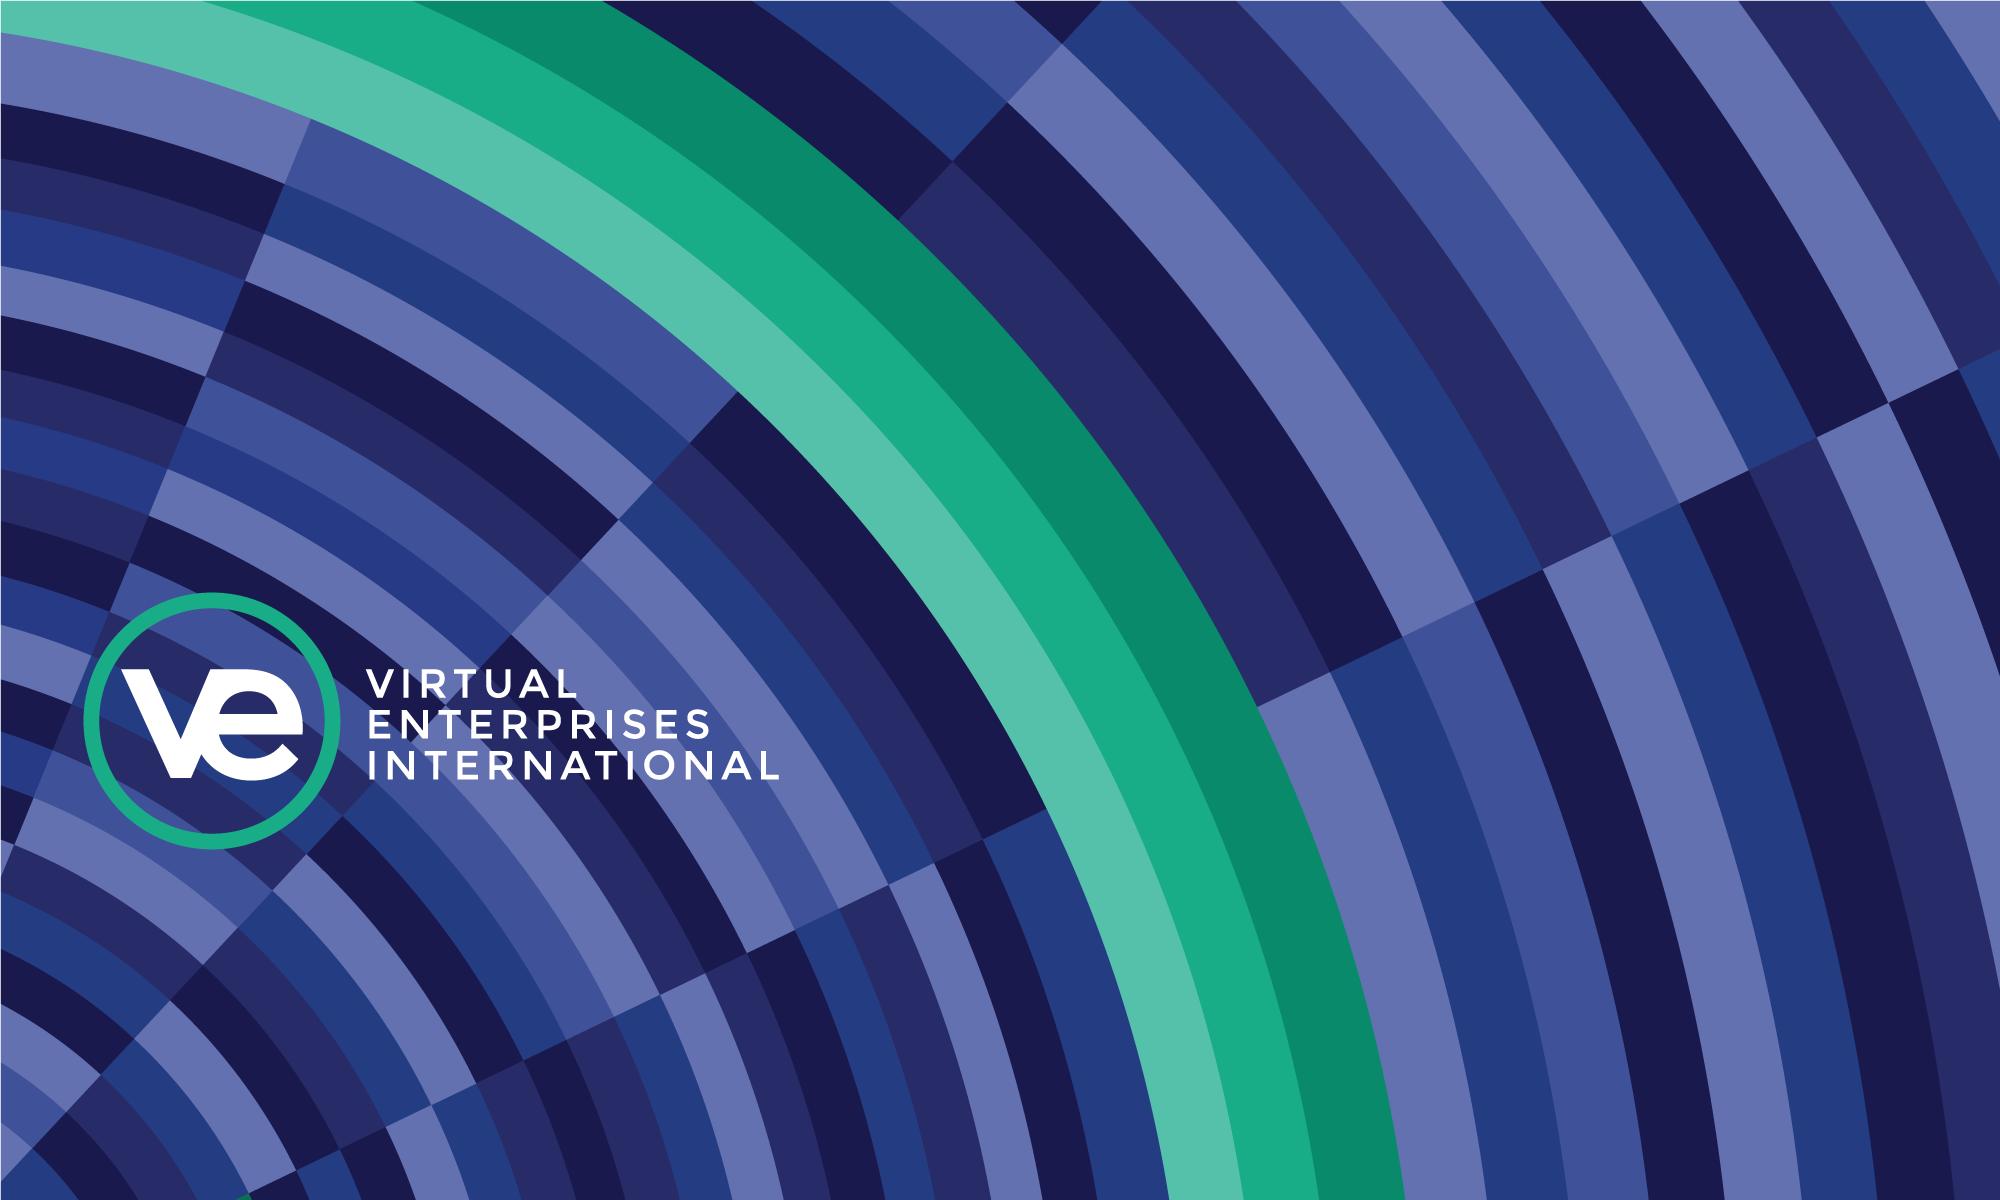 2016-17 VE Annual Report